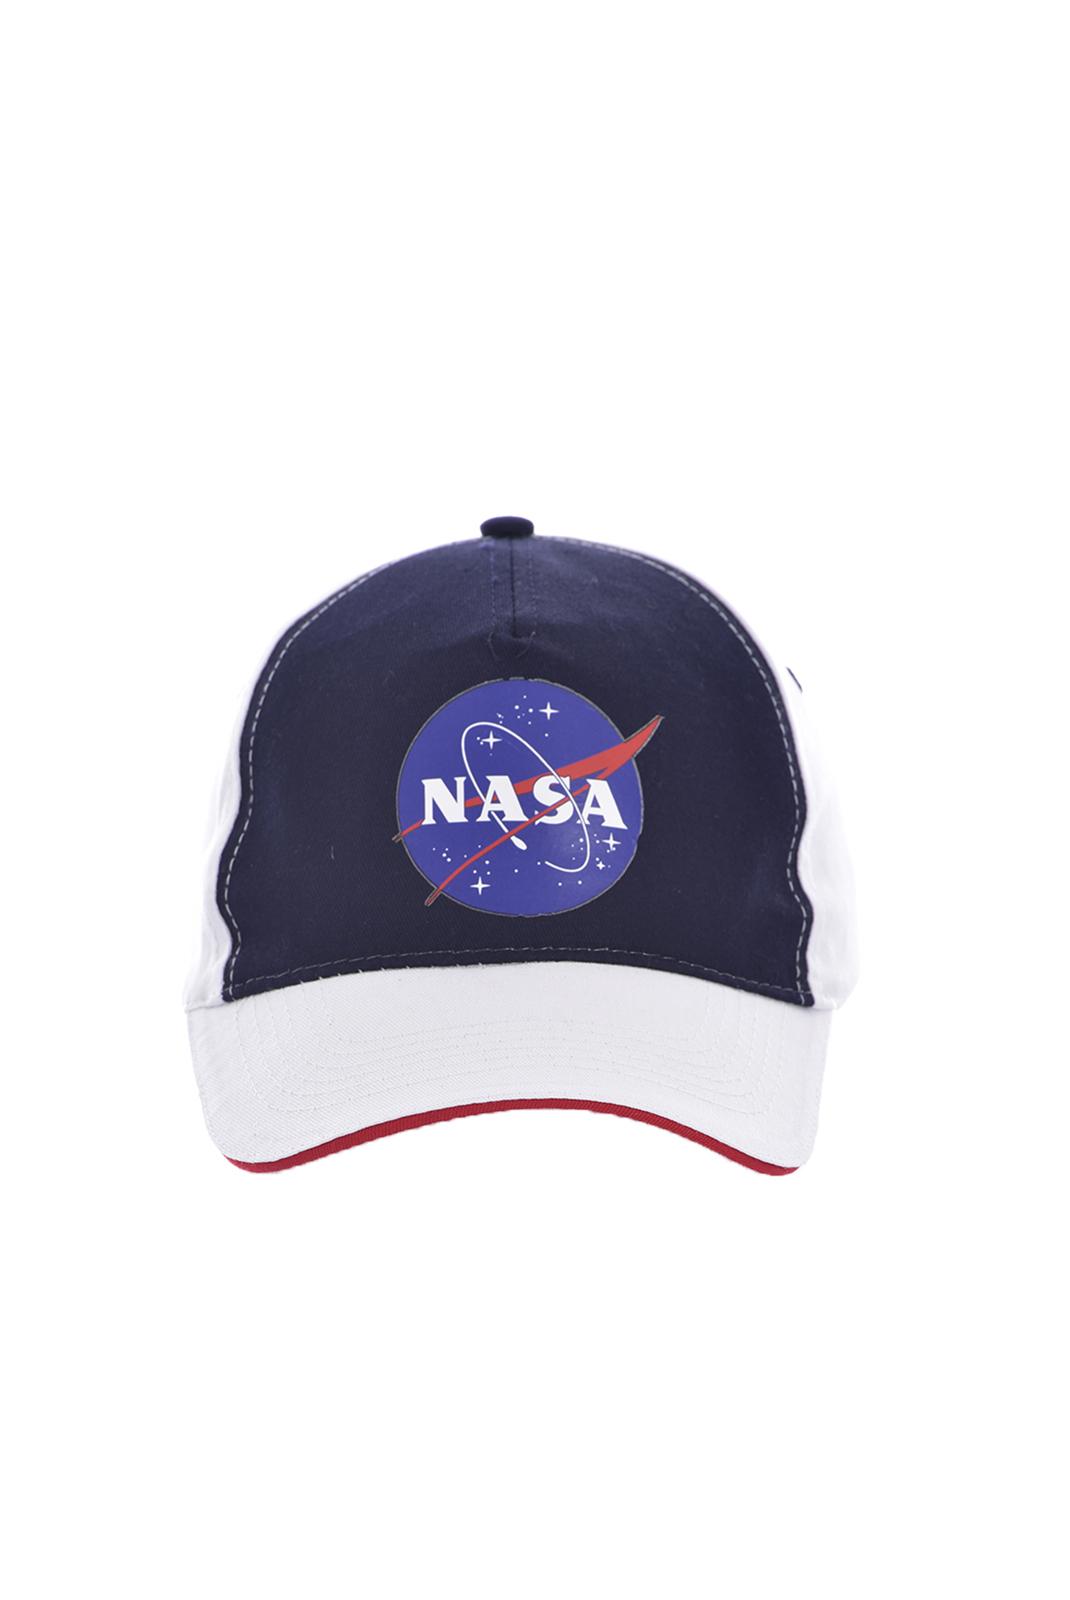 Bonnets / Casquettes  Nasa MULTI-BALL CAP NAVY